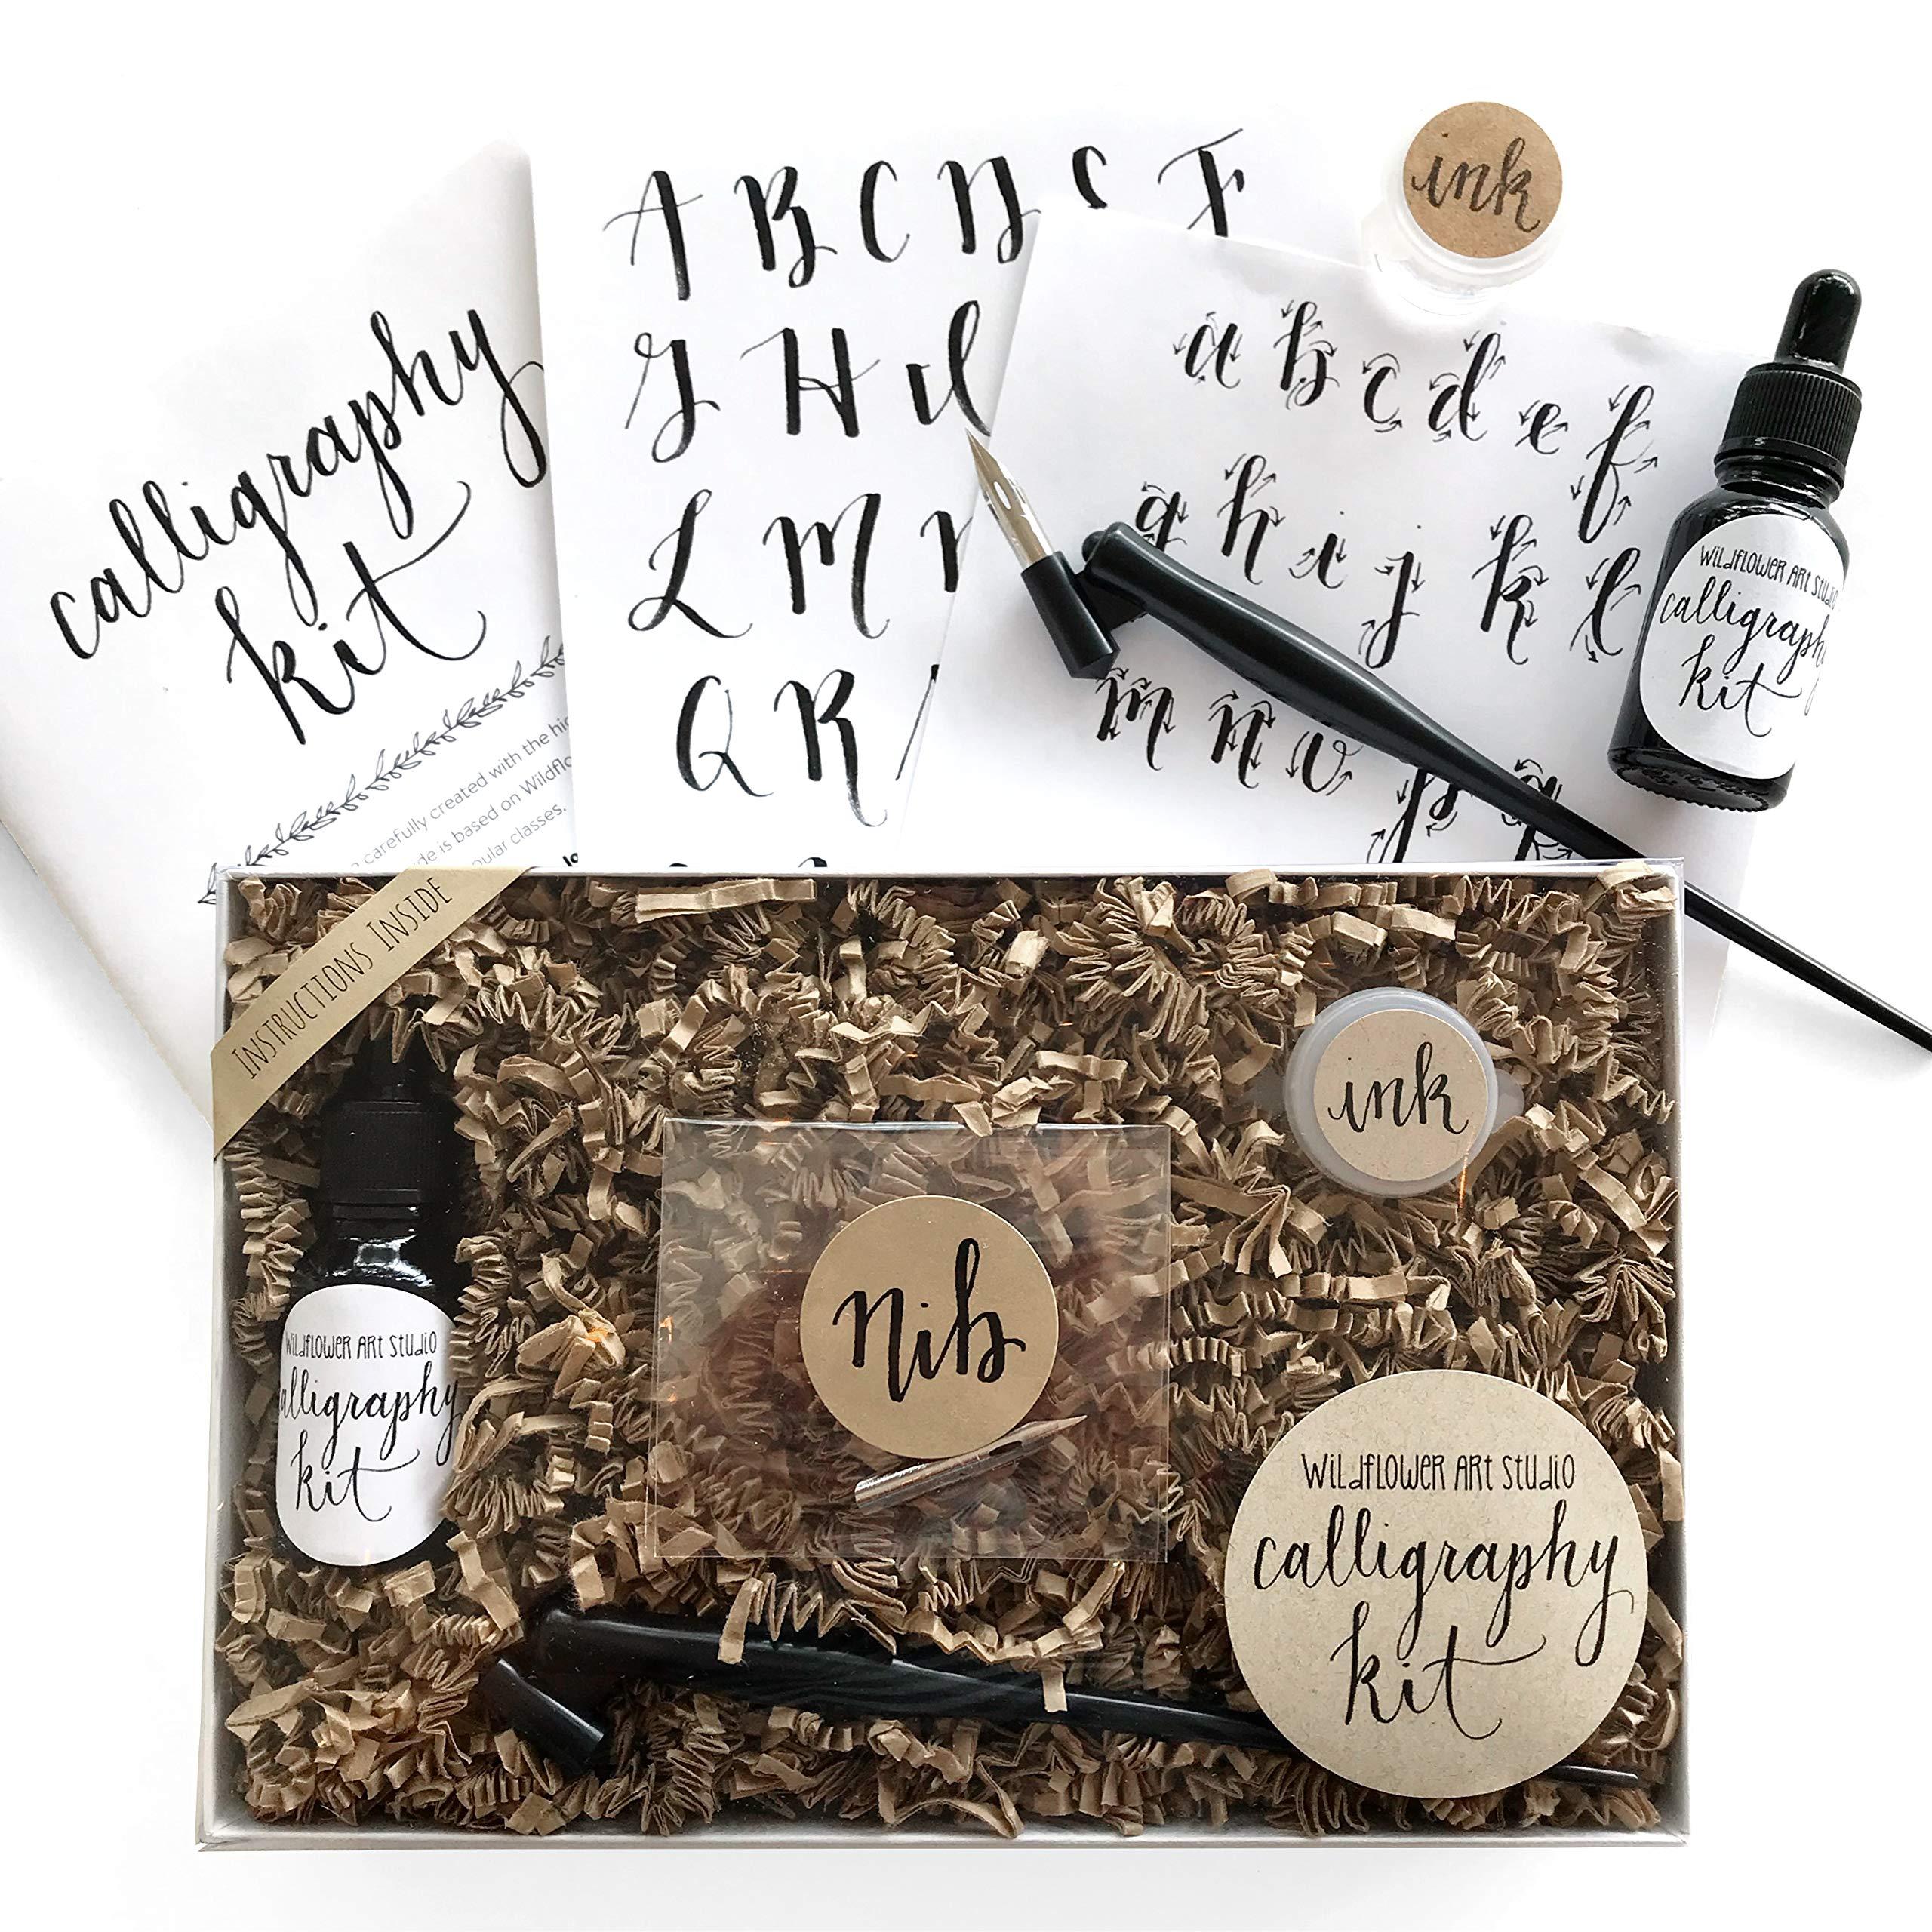 Calligraphy Starter Kit - Beginner Calligraphy Lettering Set - Beginning Modern Calligraphy DIY Kit - Oblique Pen Hand Lettering with Nib by Wildflower Art Studio